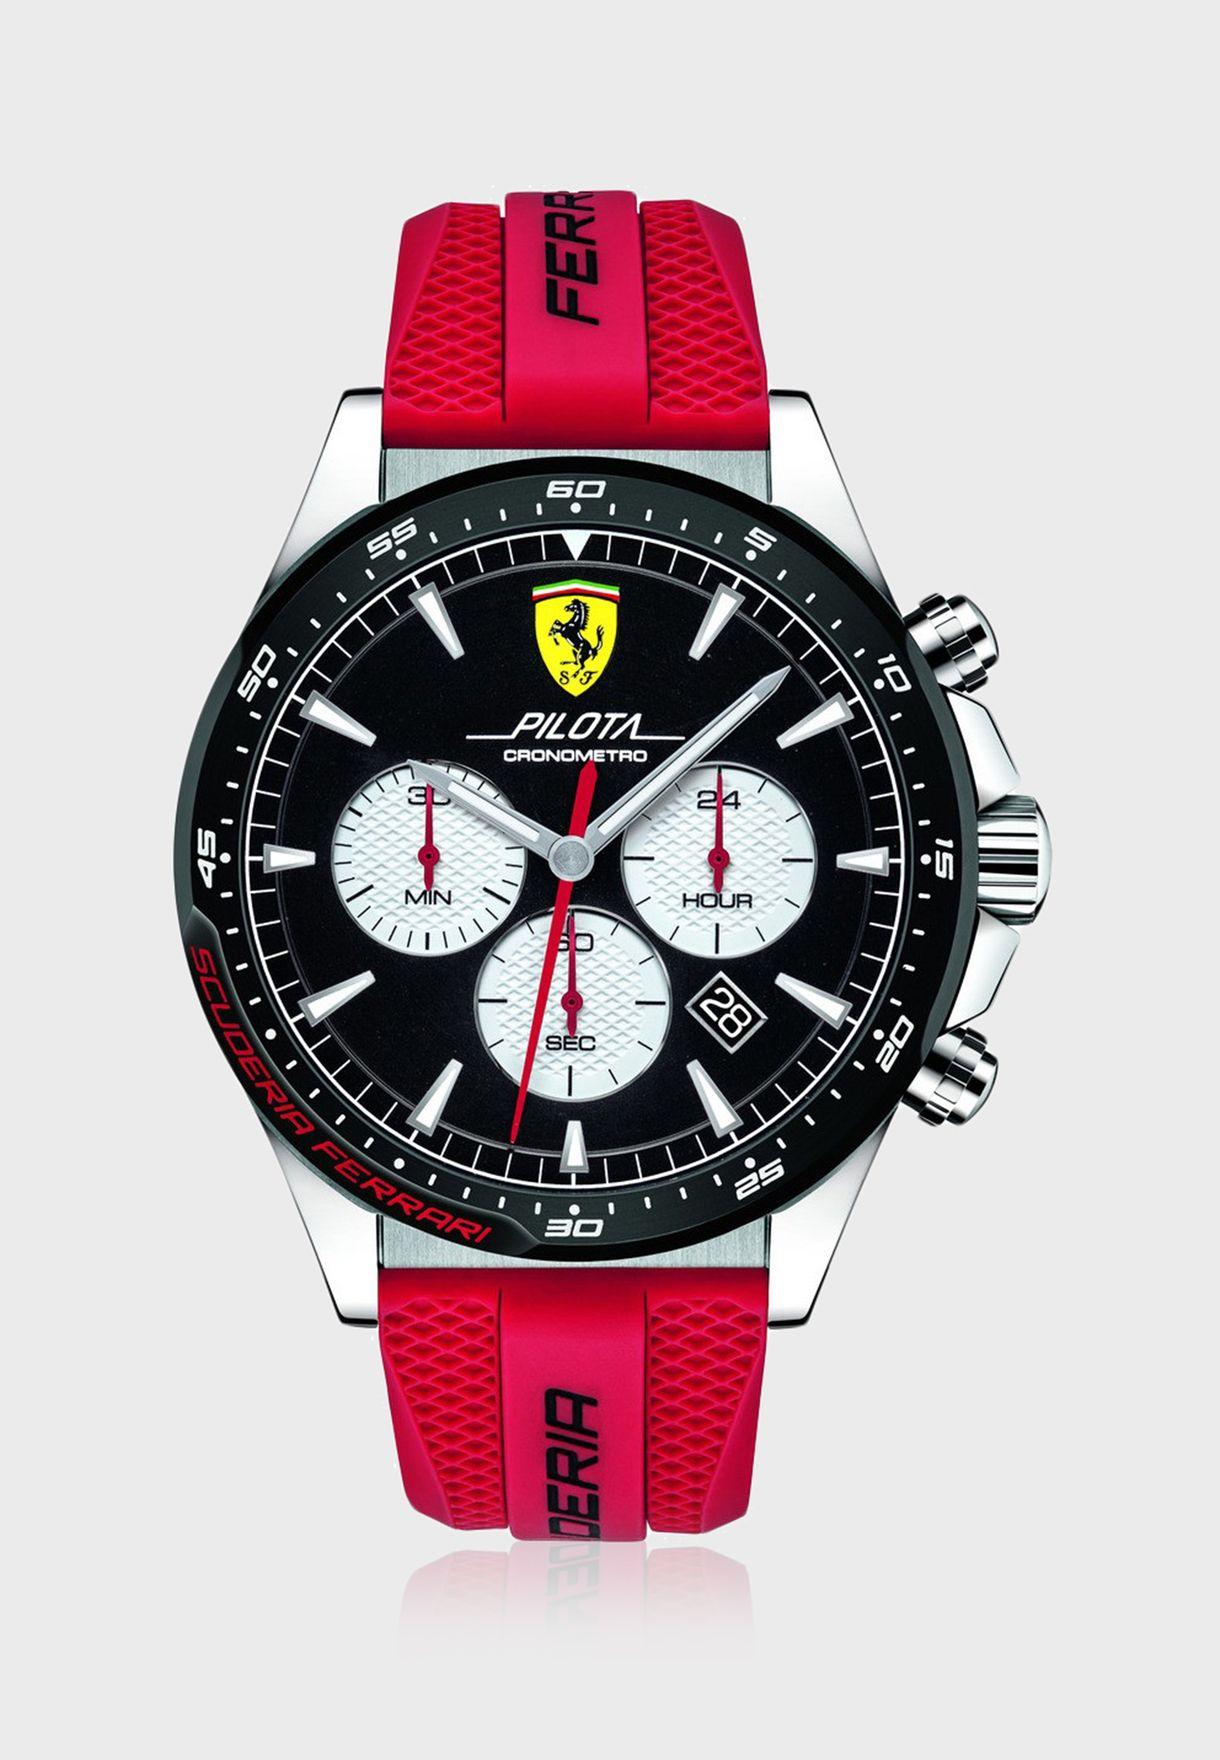 830596 Piloa Chronograph Watch